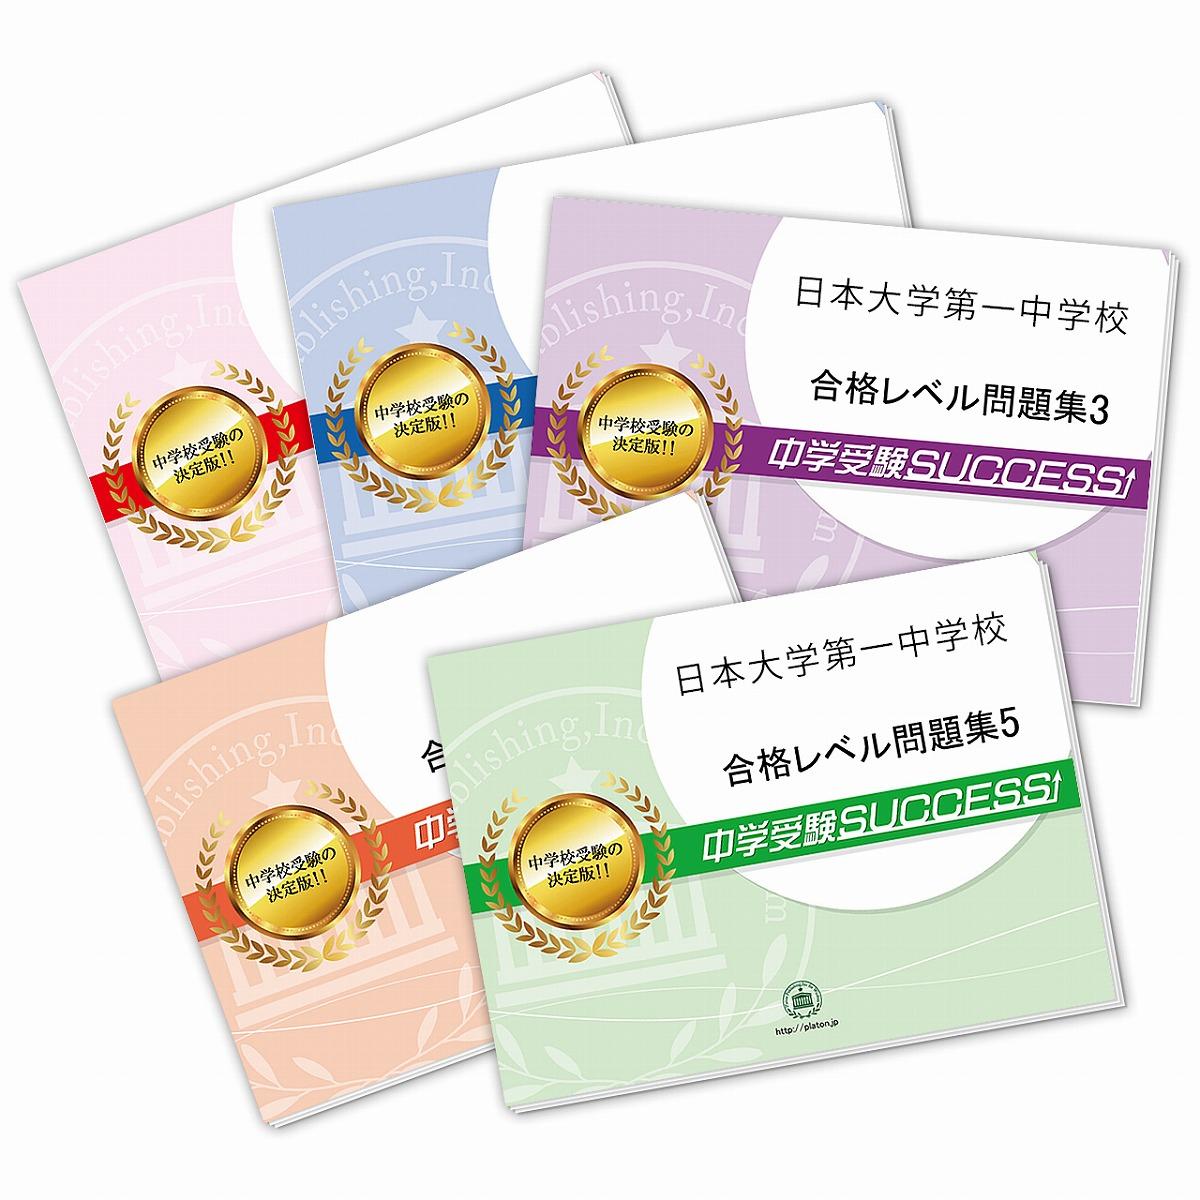 着後レビューで 送料無料 送料 出荷 代引手数料無料 日本大学第一中学校 直前対策合格セット 5冊